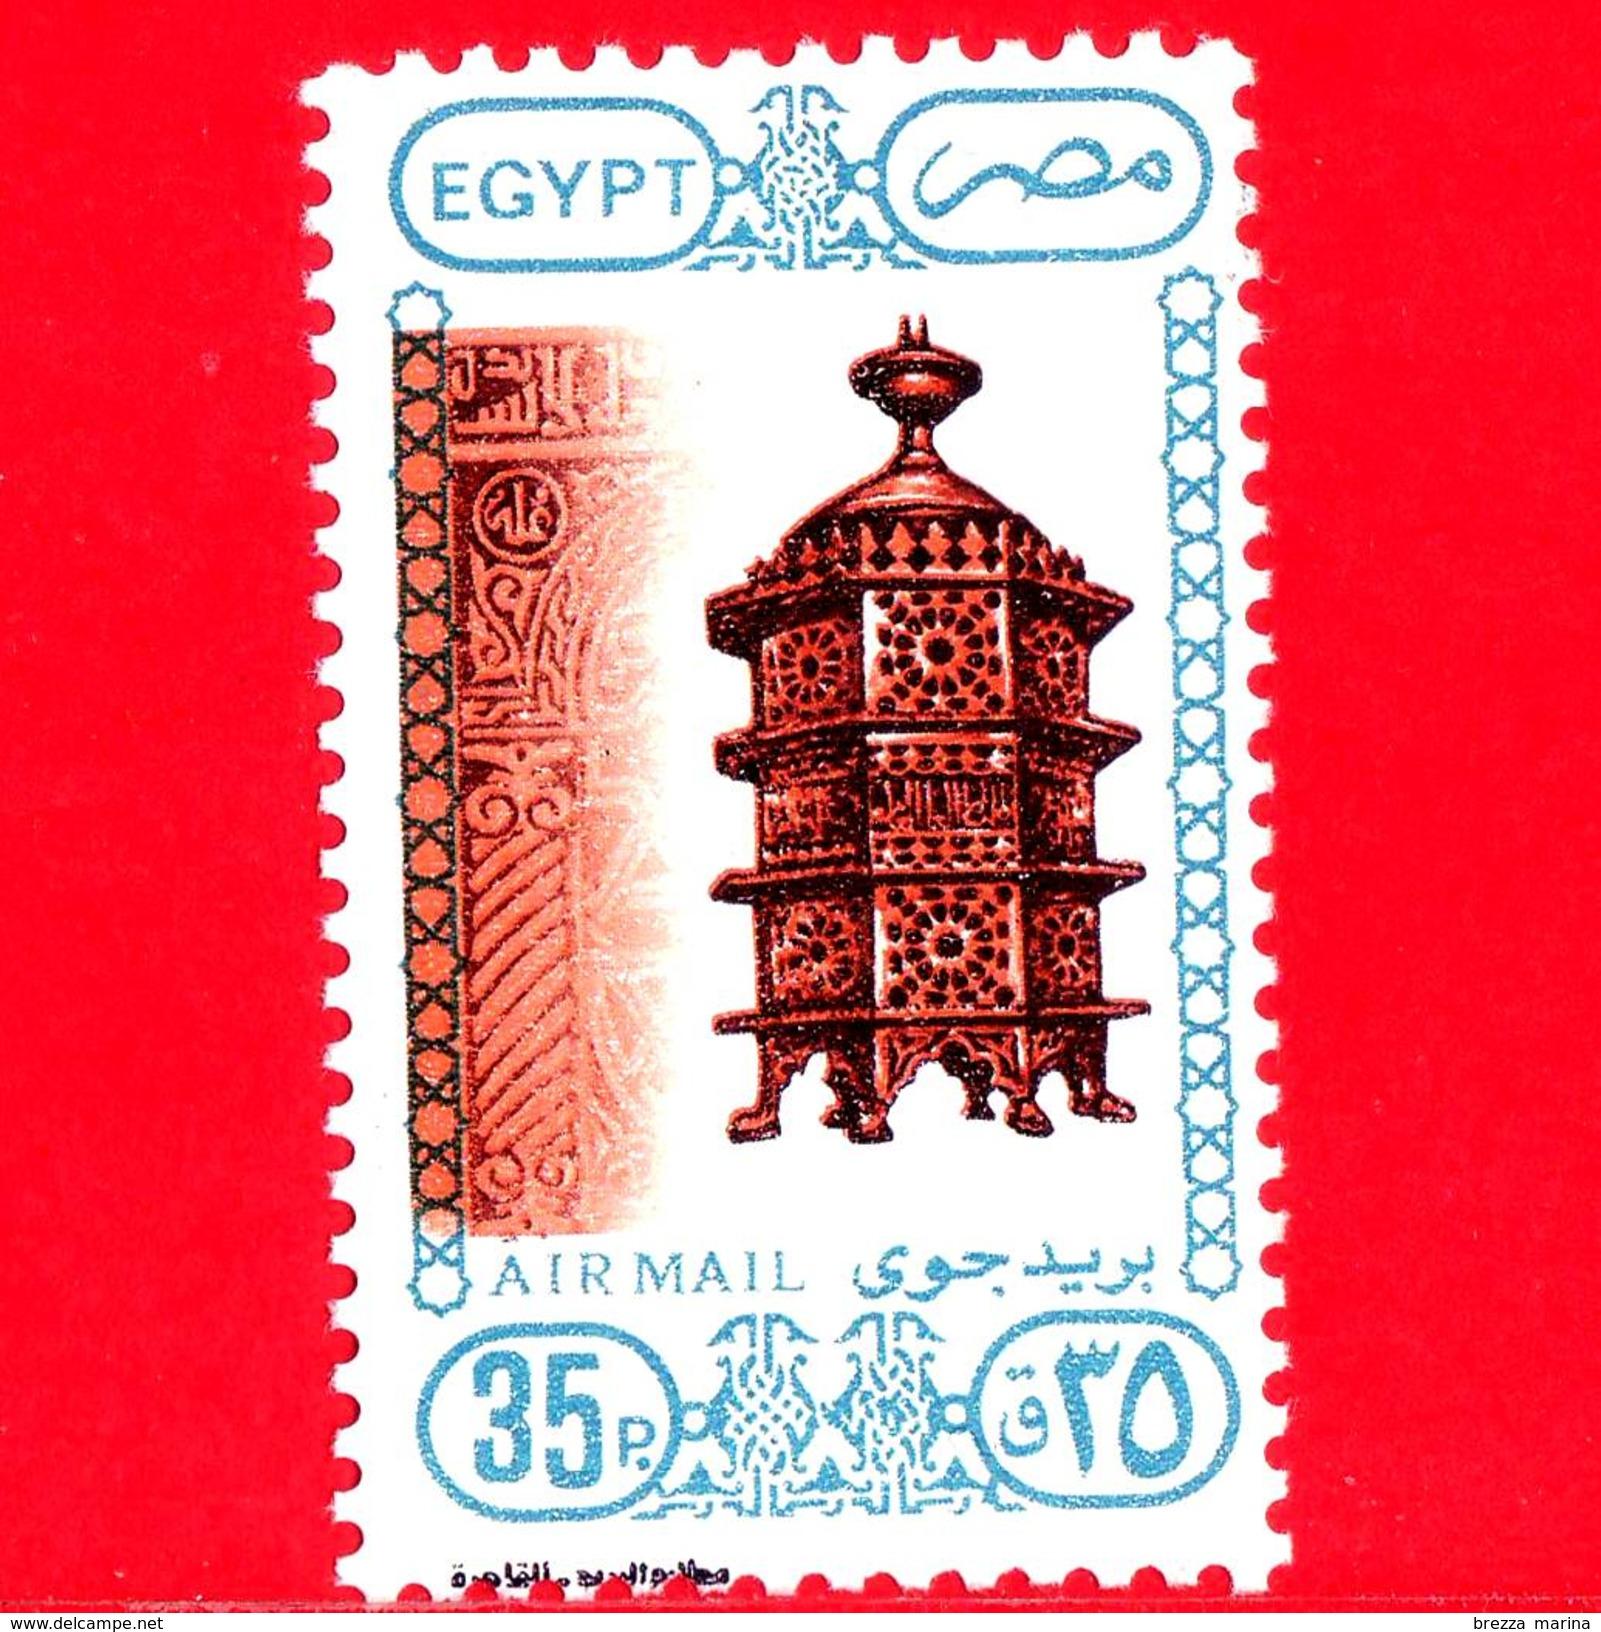 Nuovo - MNH - EGITTO - 1989 - Luoghi Di Interesse, Simboli E Opere D'arte - Lampione - Lanterna - 35 - Posta Aerea - - Poste Aérienne